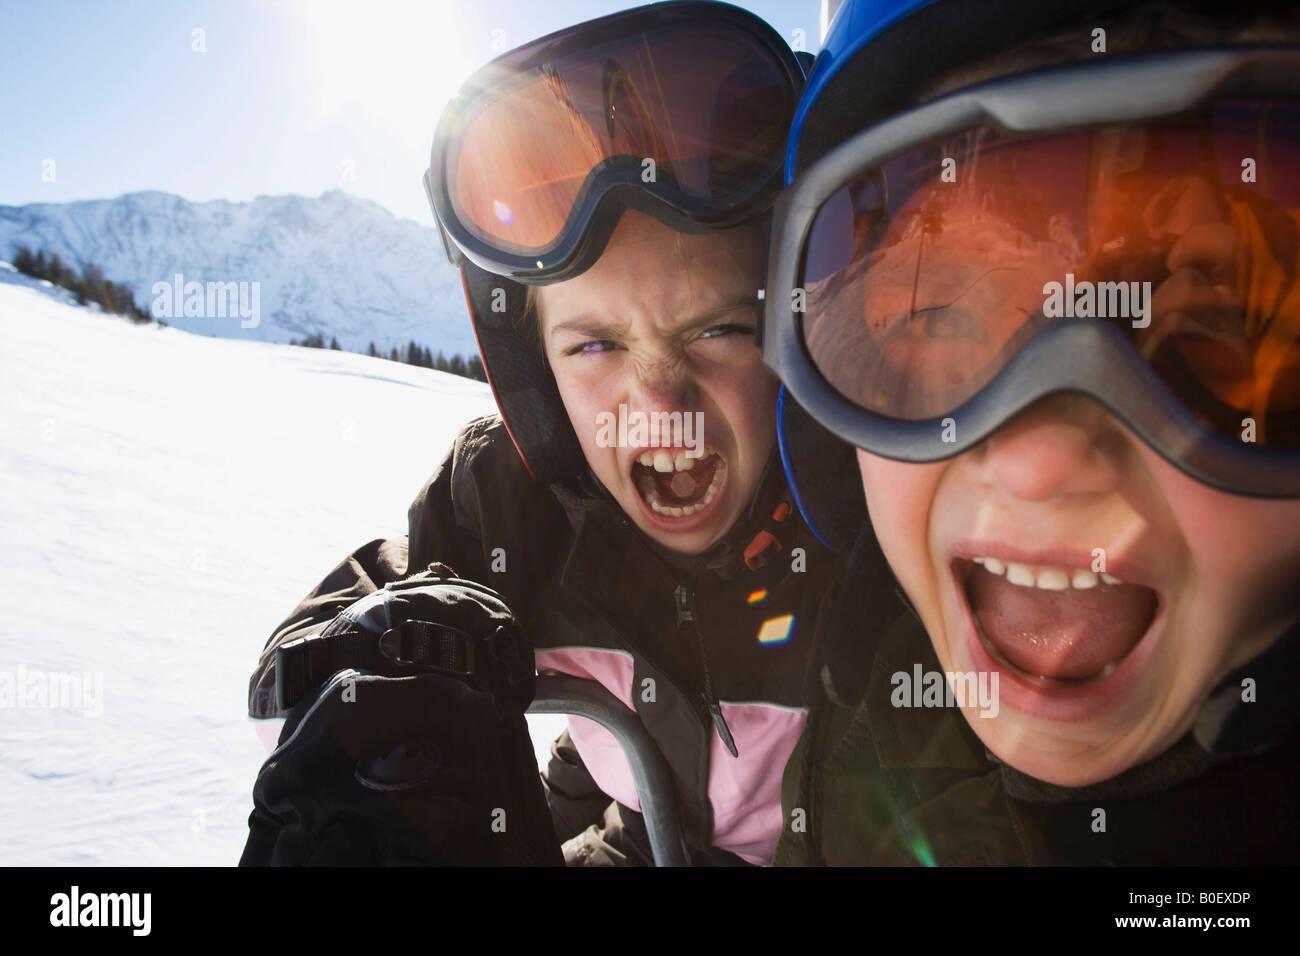 Children in ski helmets and goggles Stock Photo